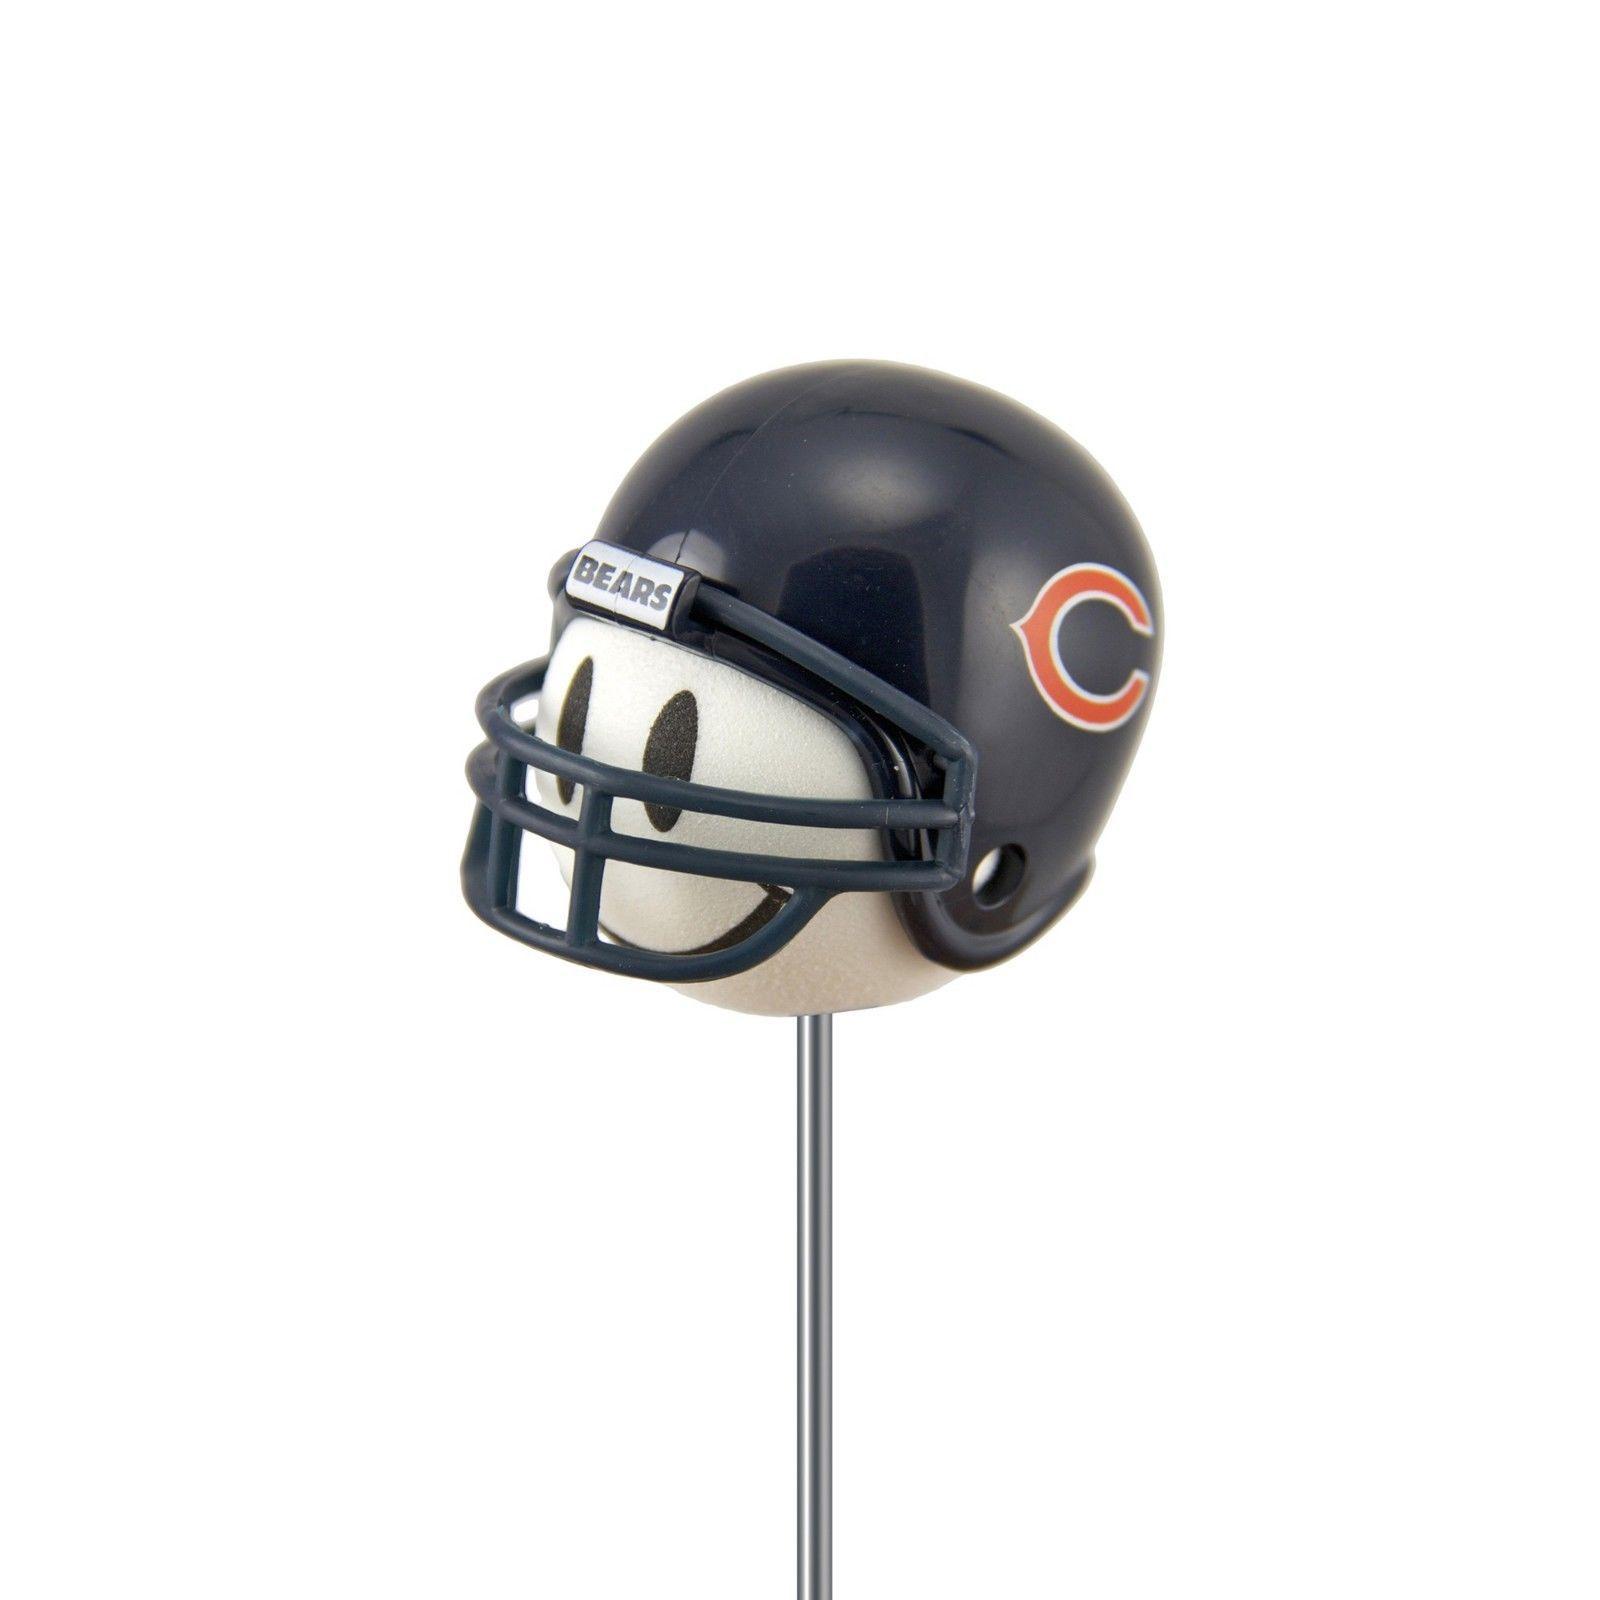 $4 66 - Chicago Bears Football Helmet Smiley Antenna Or